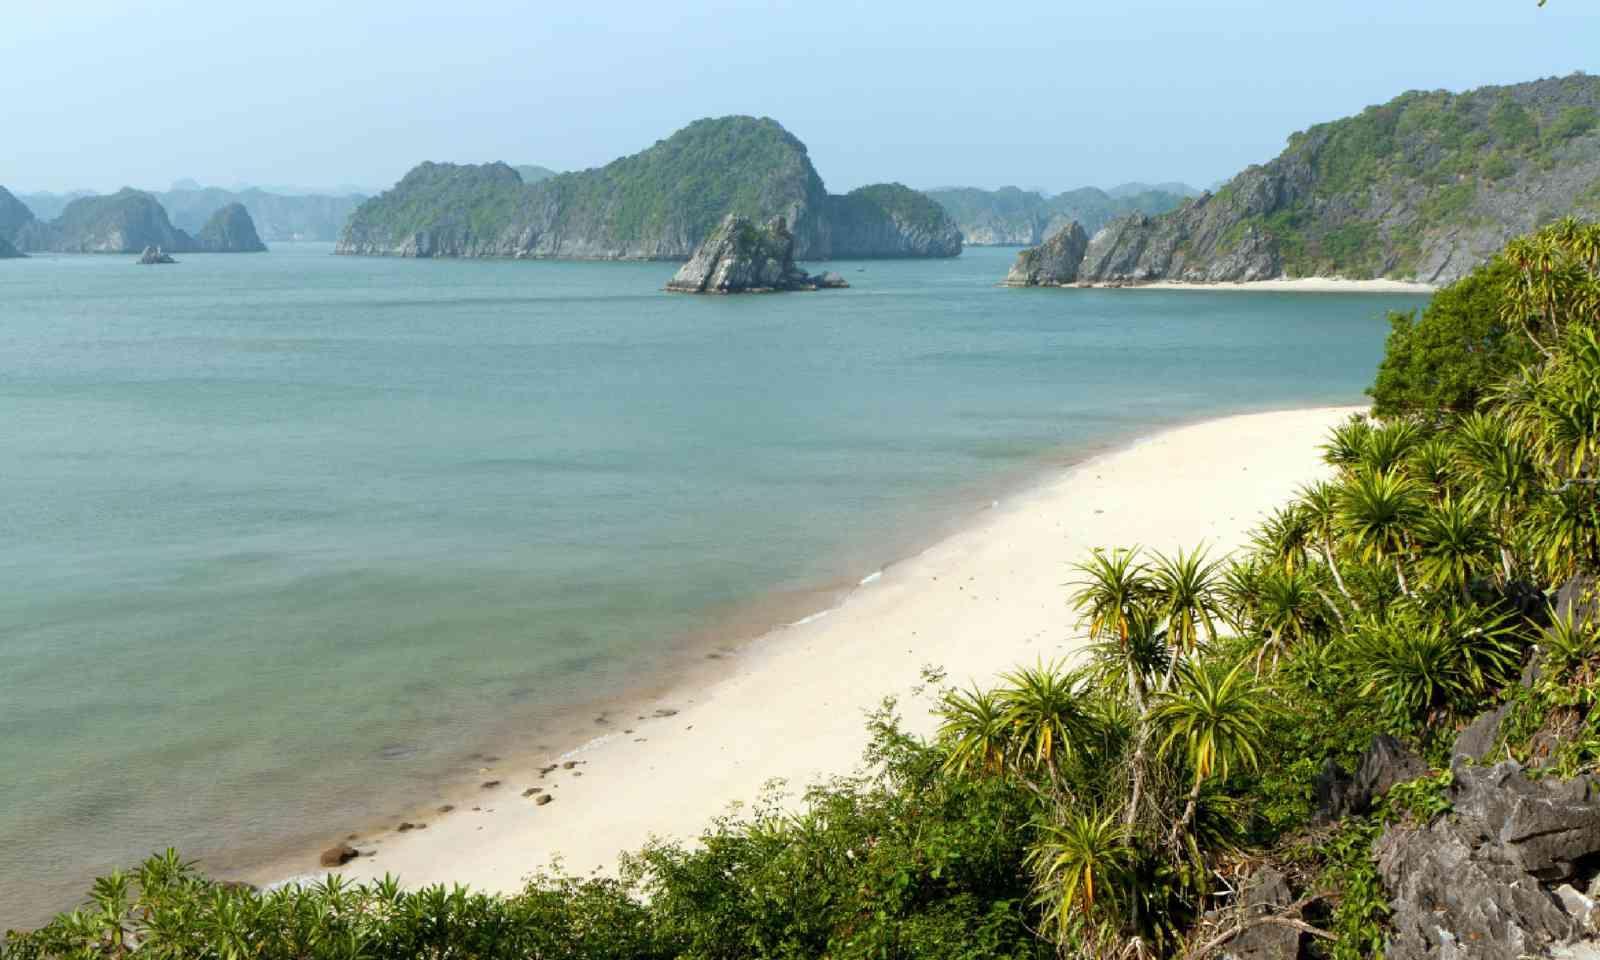 Lan Ha Bay in Vietnam (Shutterstock)